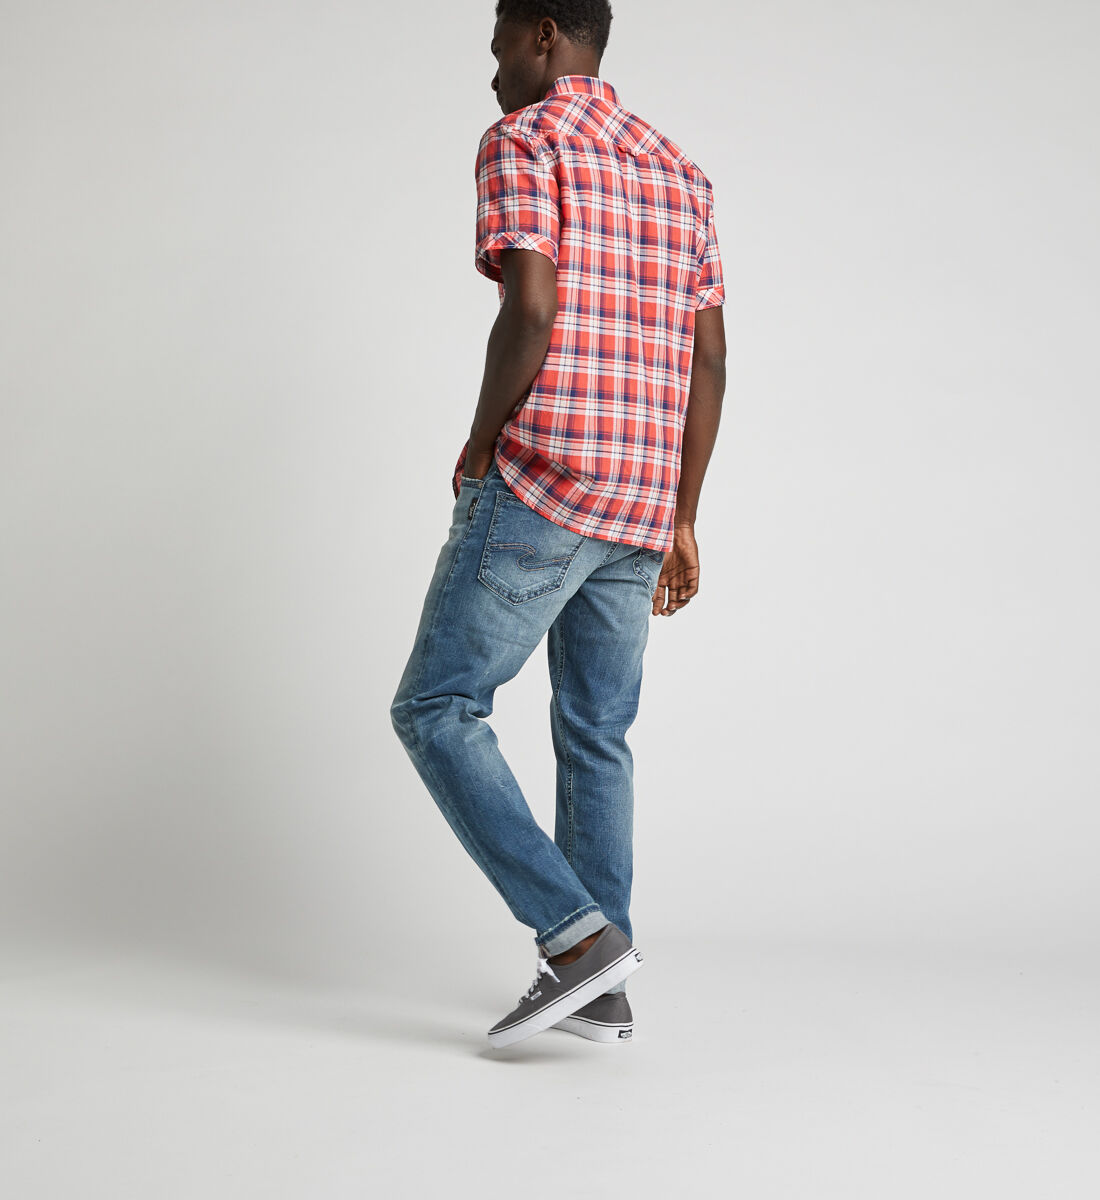 Cassidy Plaid Shirt Side